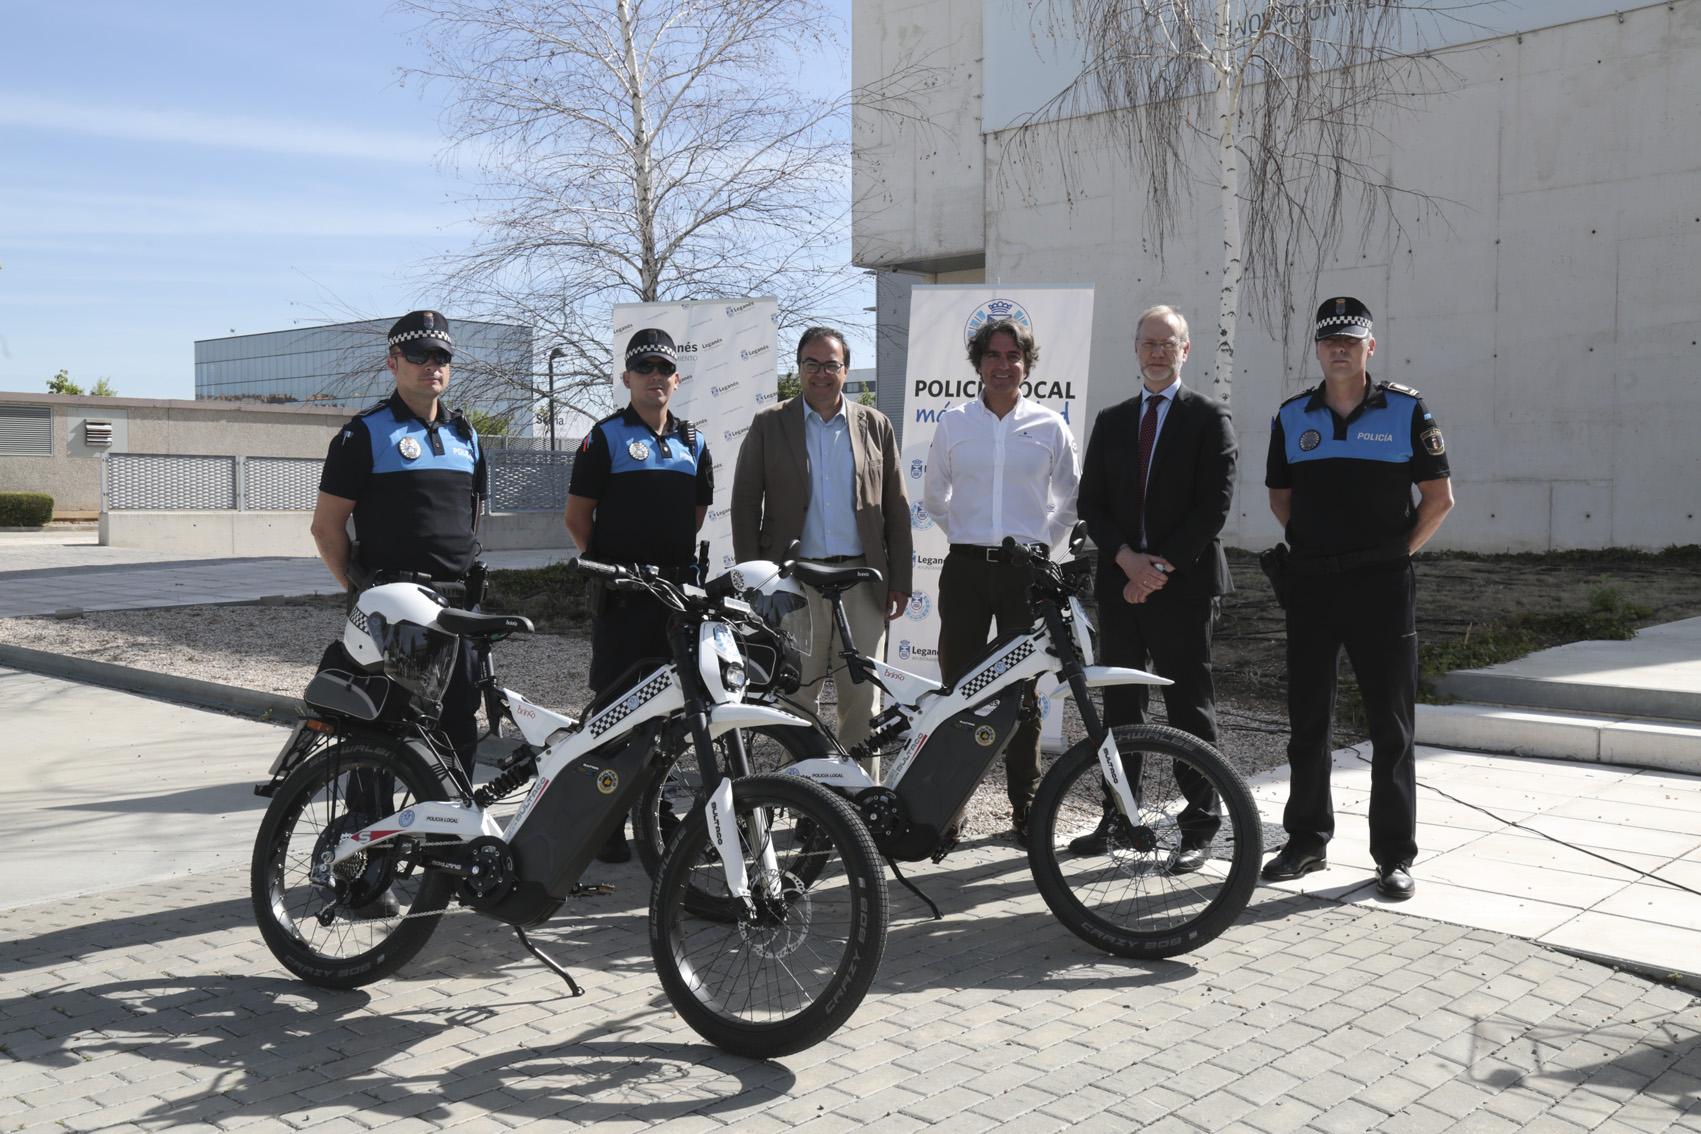 La Policia Local de Leganés va en Bultaco